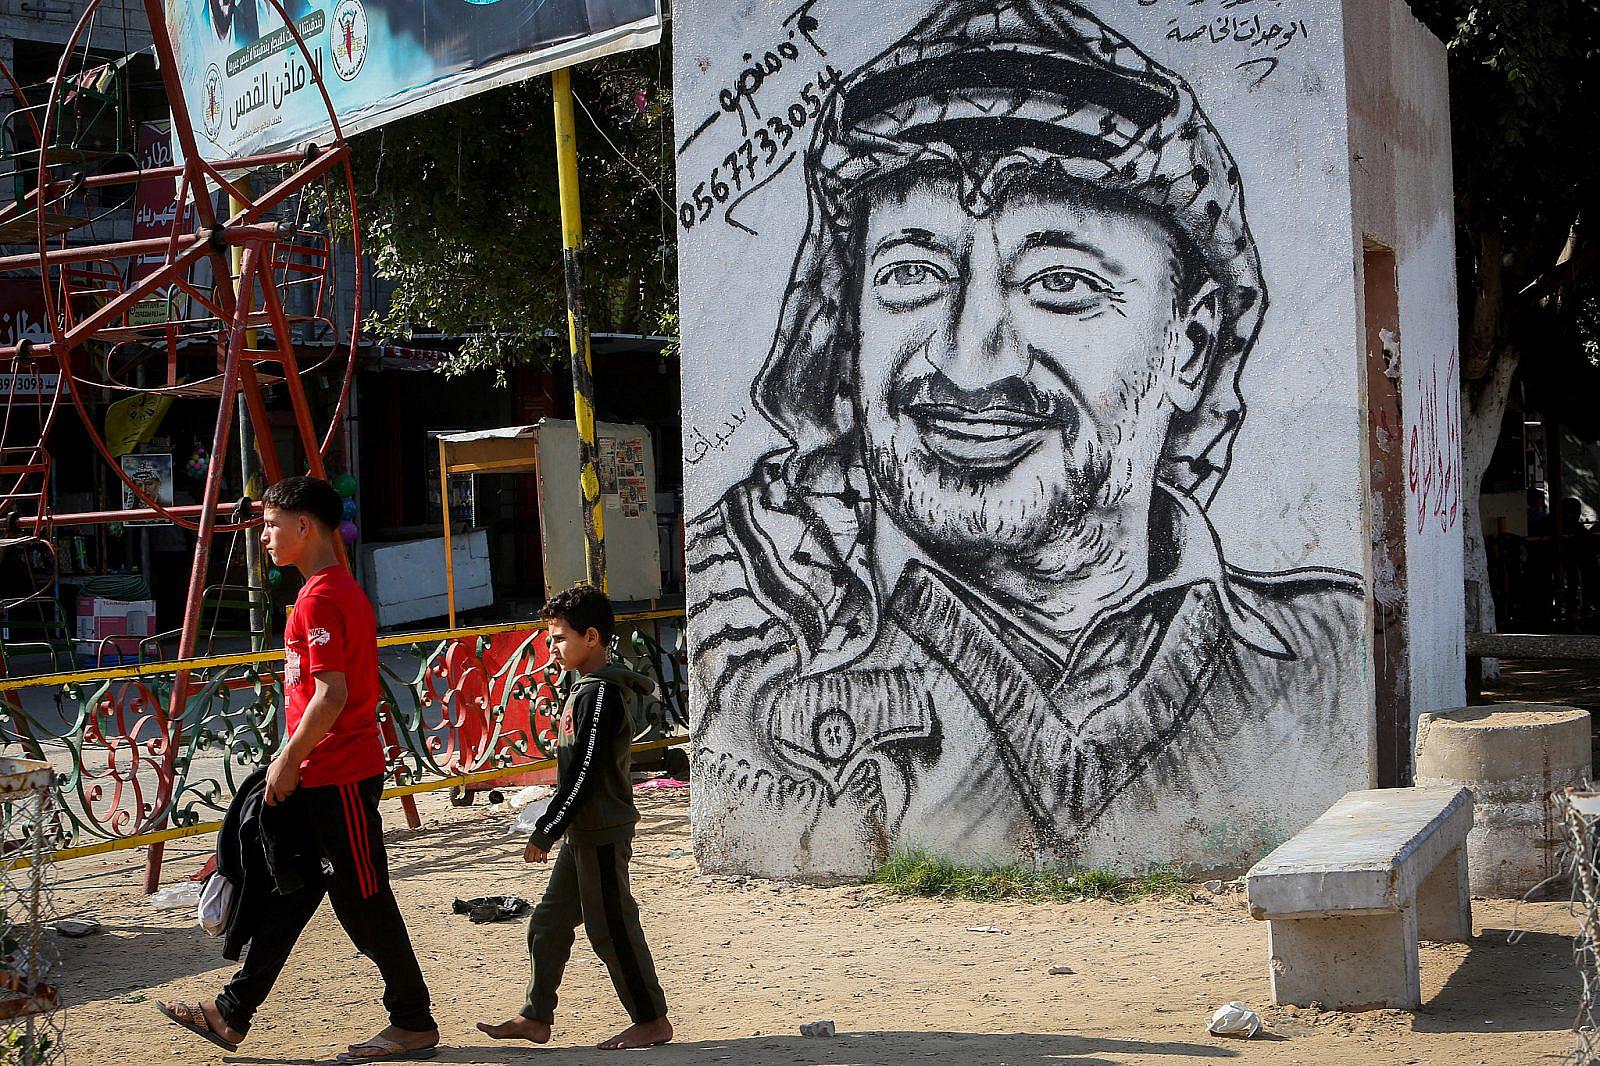 Palestinians walk near a mural depicting late Palestinian leader Yasser Arafat in Rafah, in the southern Gaza Strip, November 11, 2020. (Abed Rahim Khatib/Flash90 )